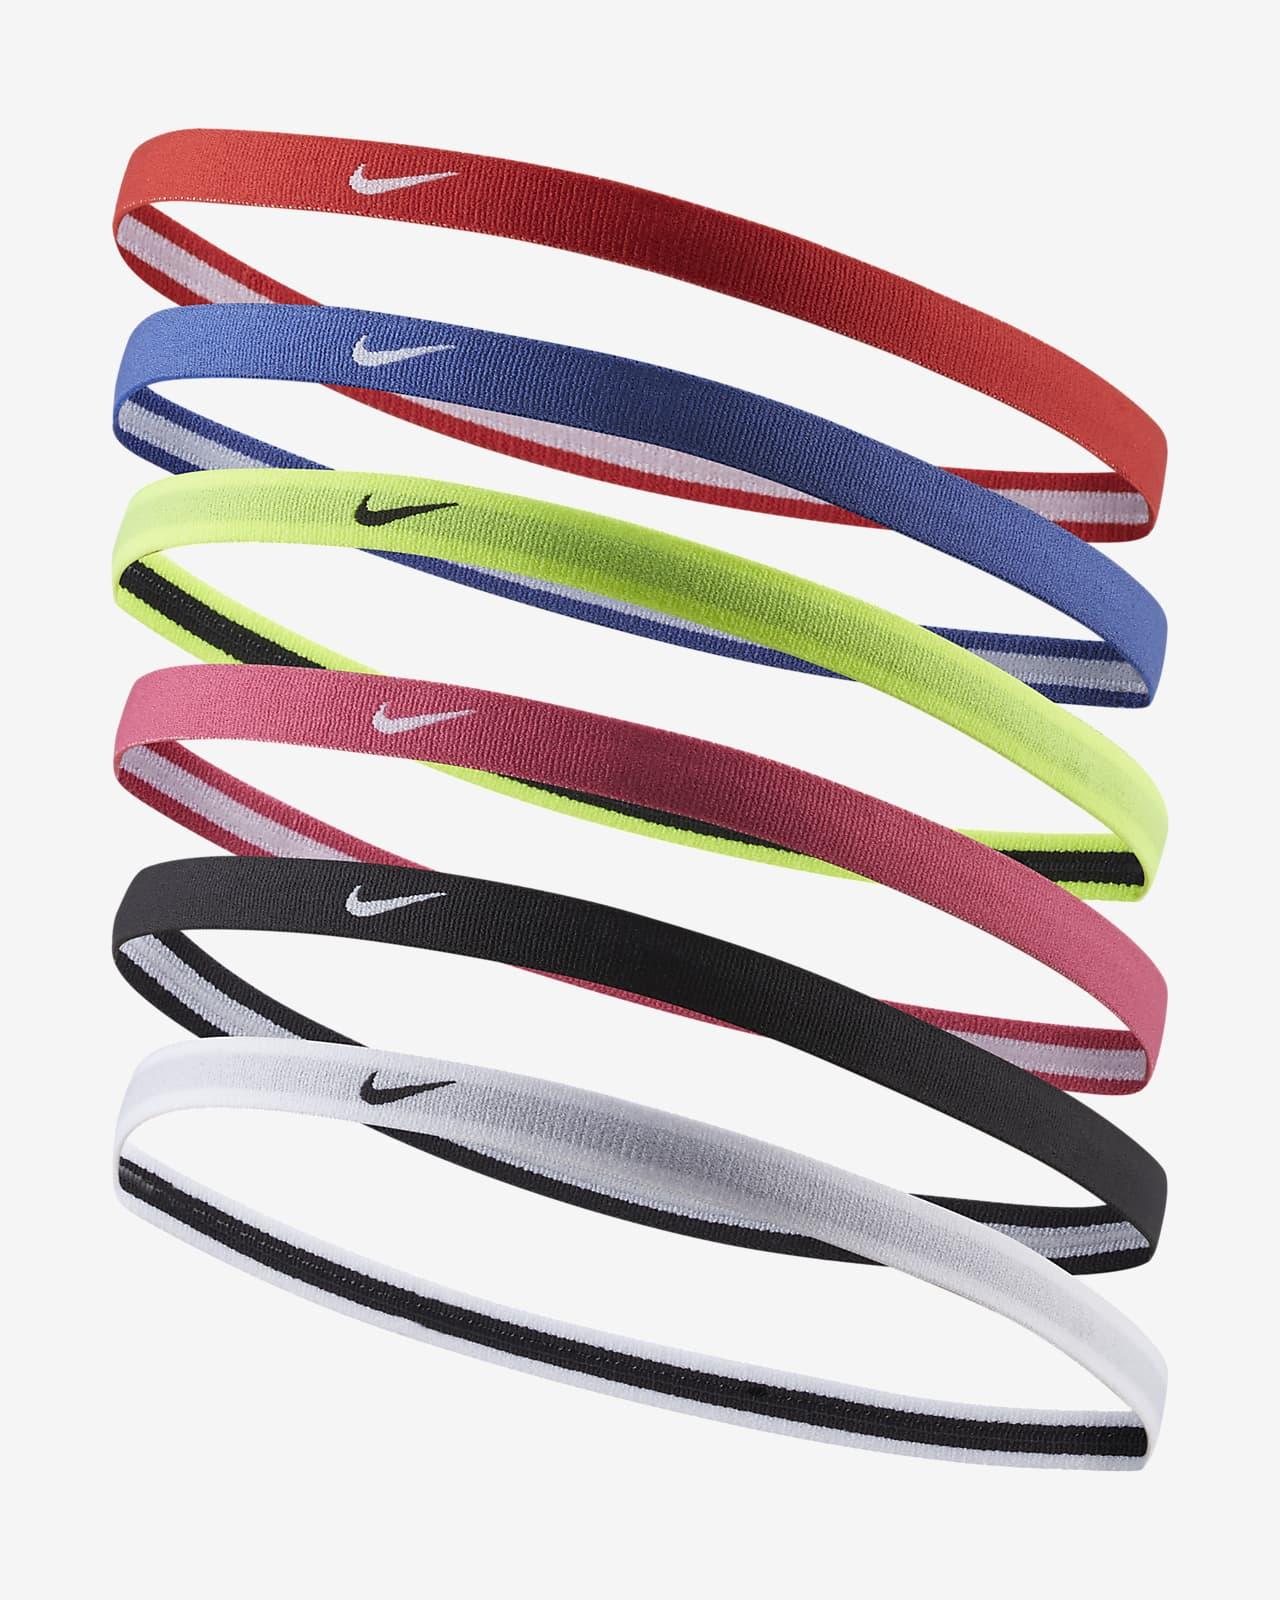 porcelana empezar colorante  Nike Swoosh Kids' Headbands (6 Pack). Nike.com